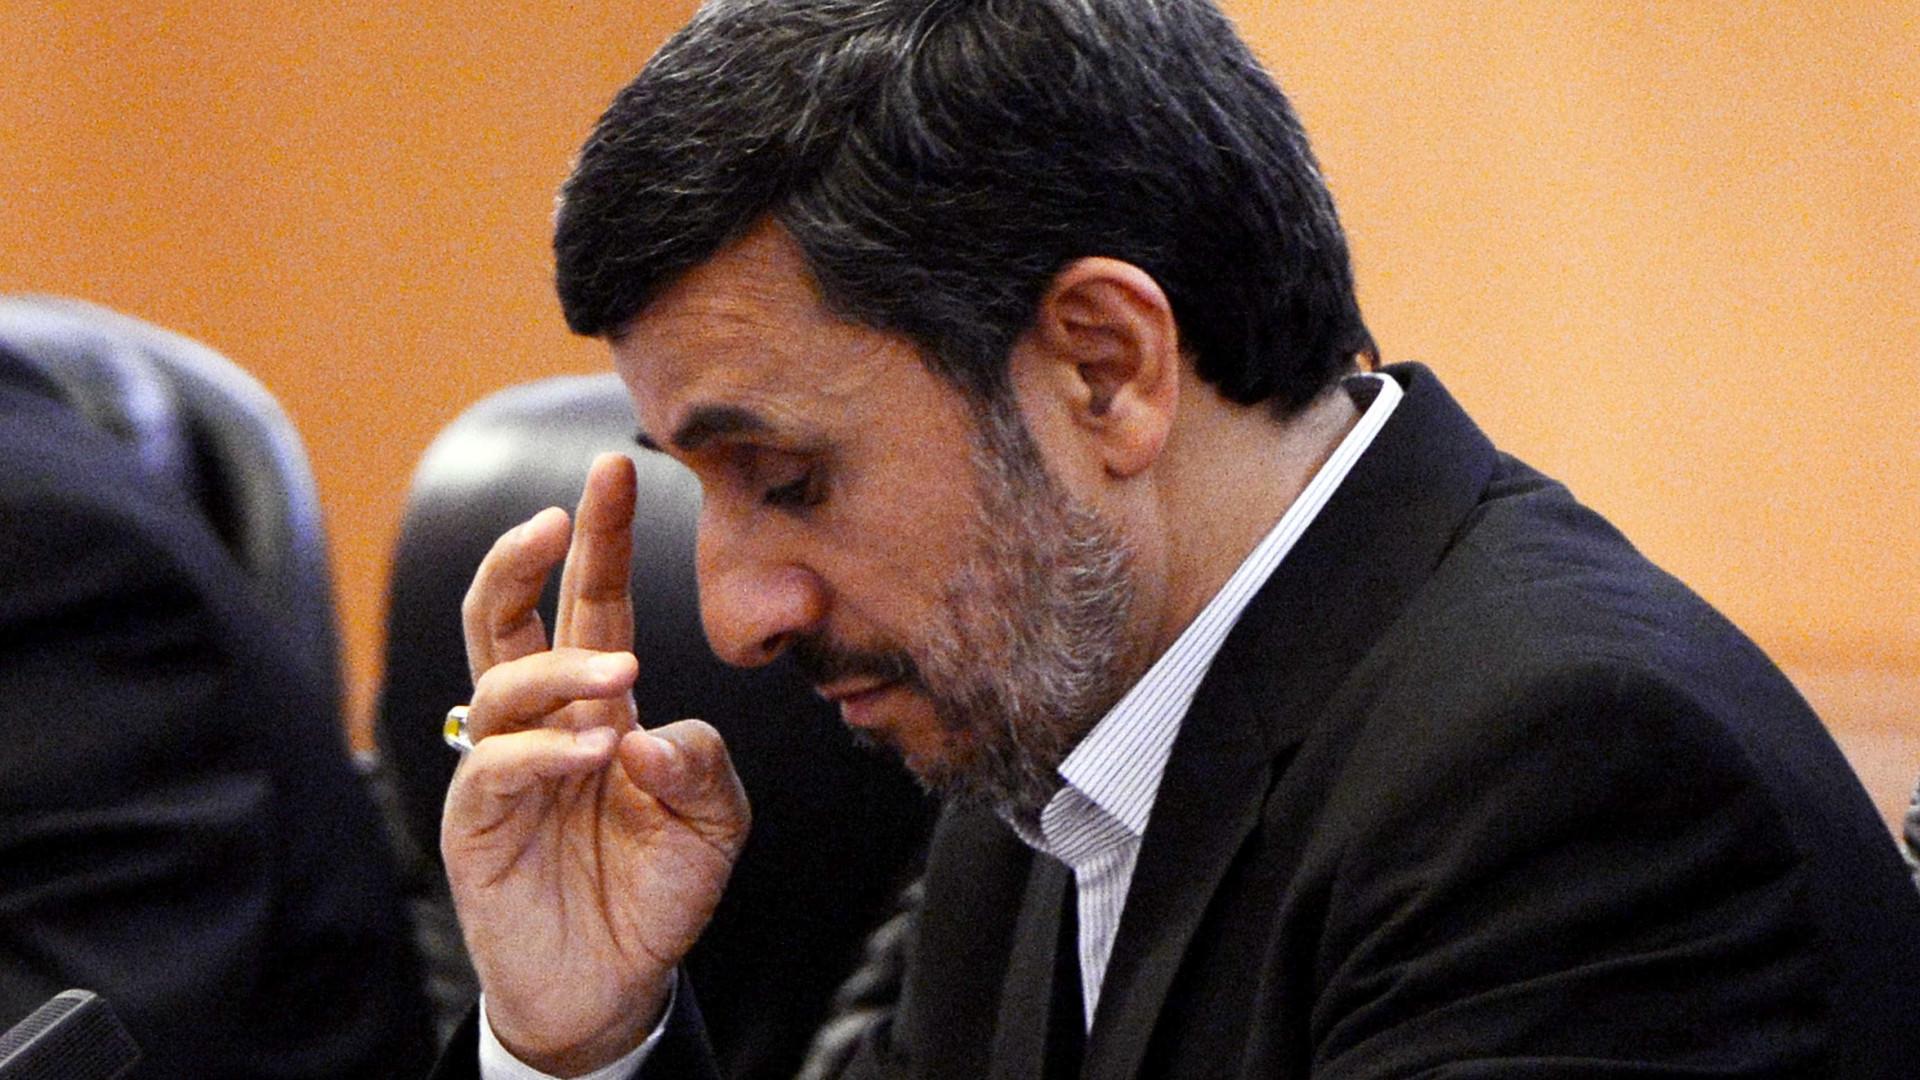 Irã inicia corrida presidencial  com veto a Ahmadinejad